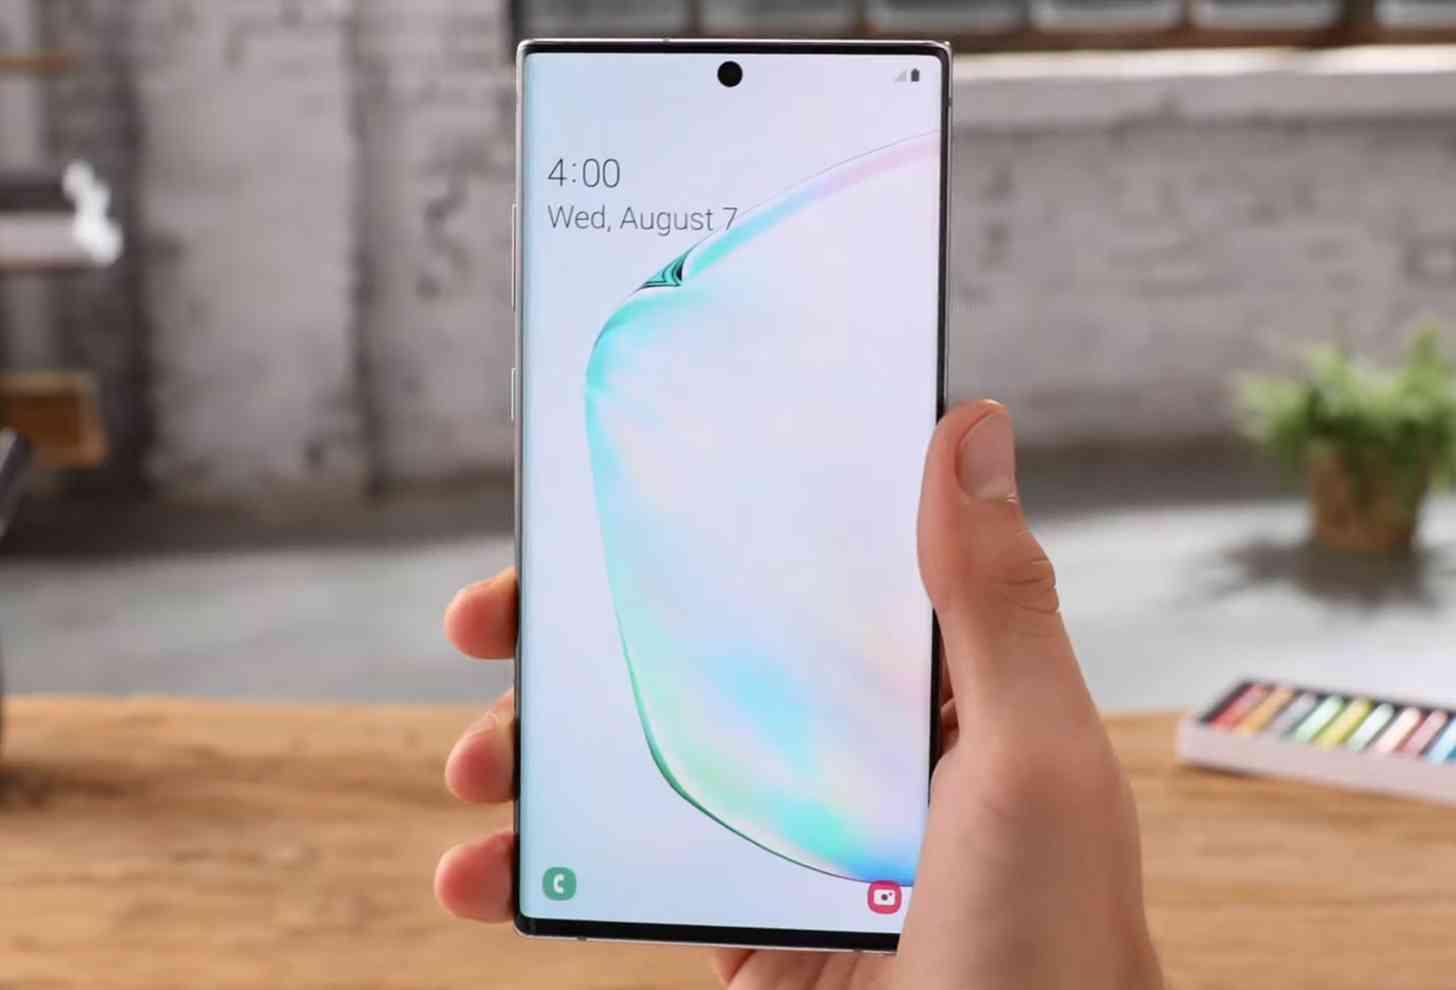 Galaxy Note 10+ display